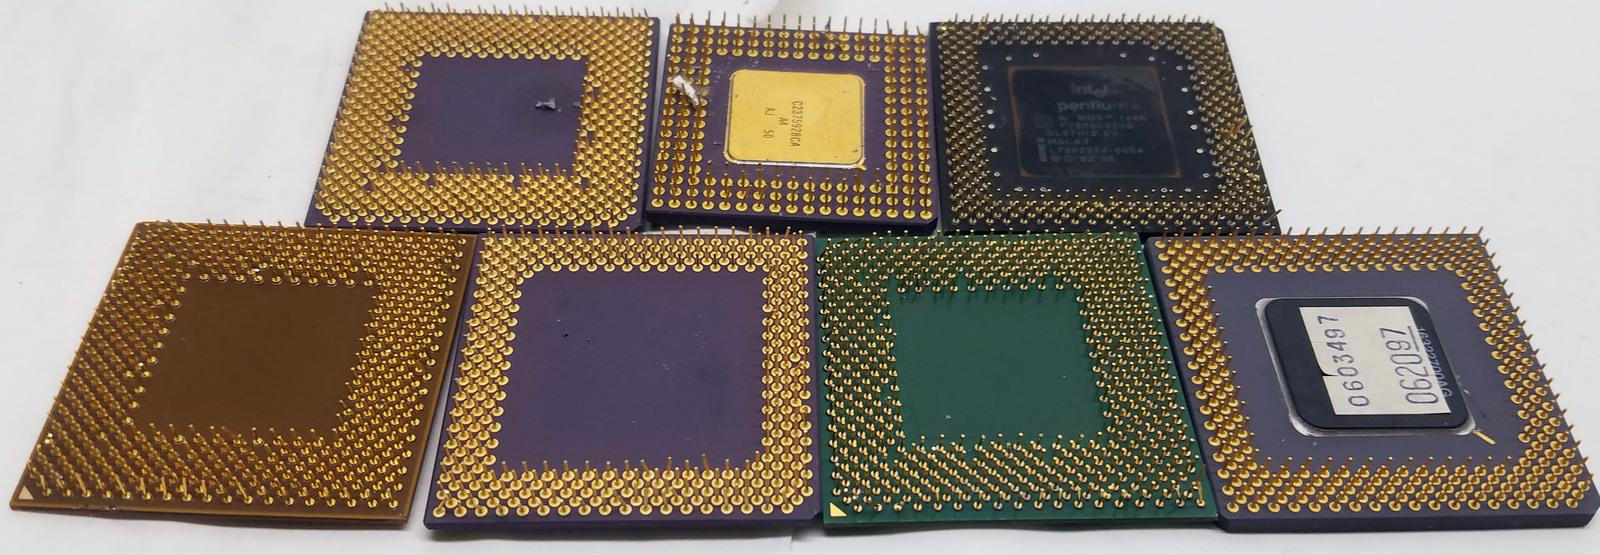 Gold Recovery and Scrap 486/Athlon/MMX/Pentium/K6/Ceramics/Other 7.65Lbs Bin:10